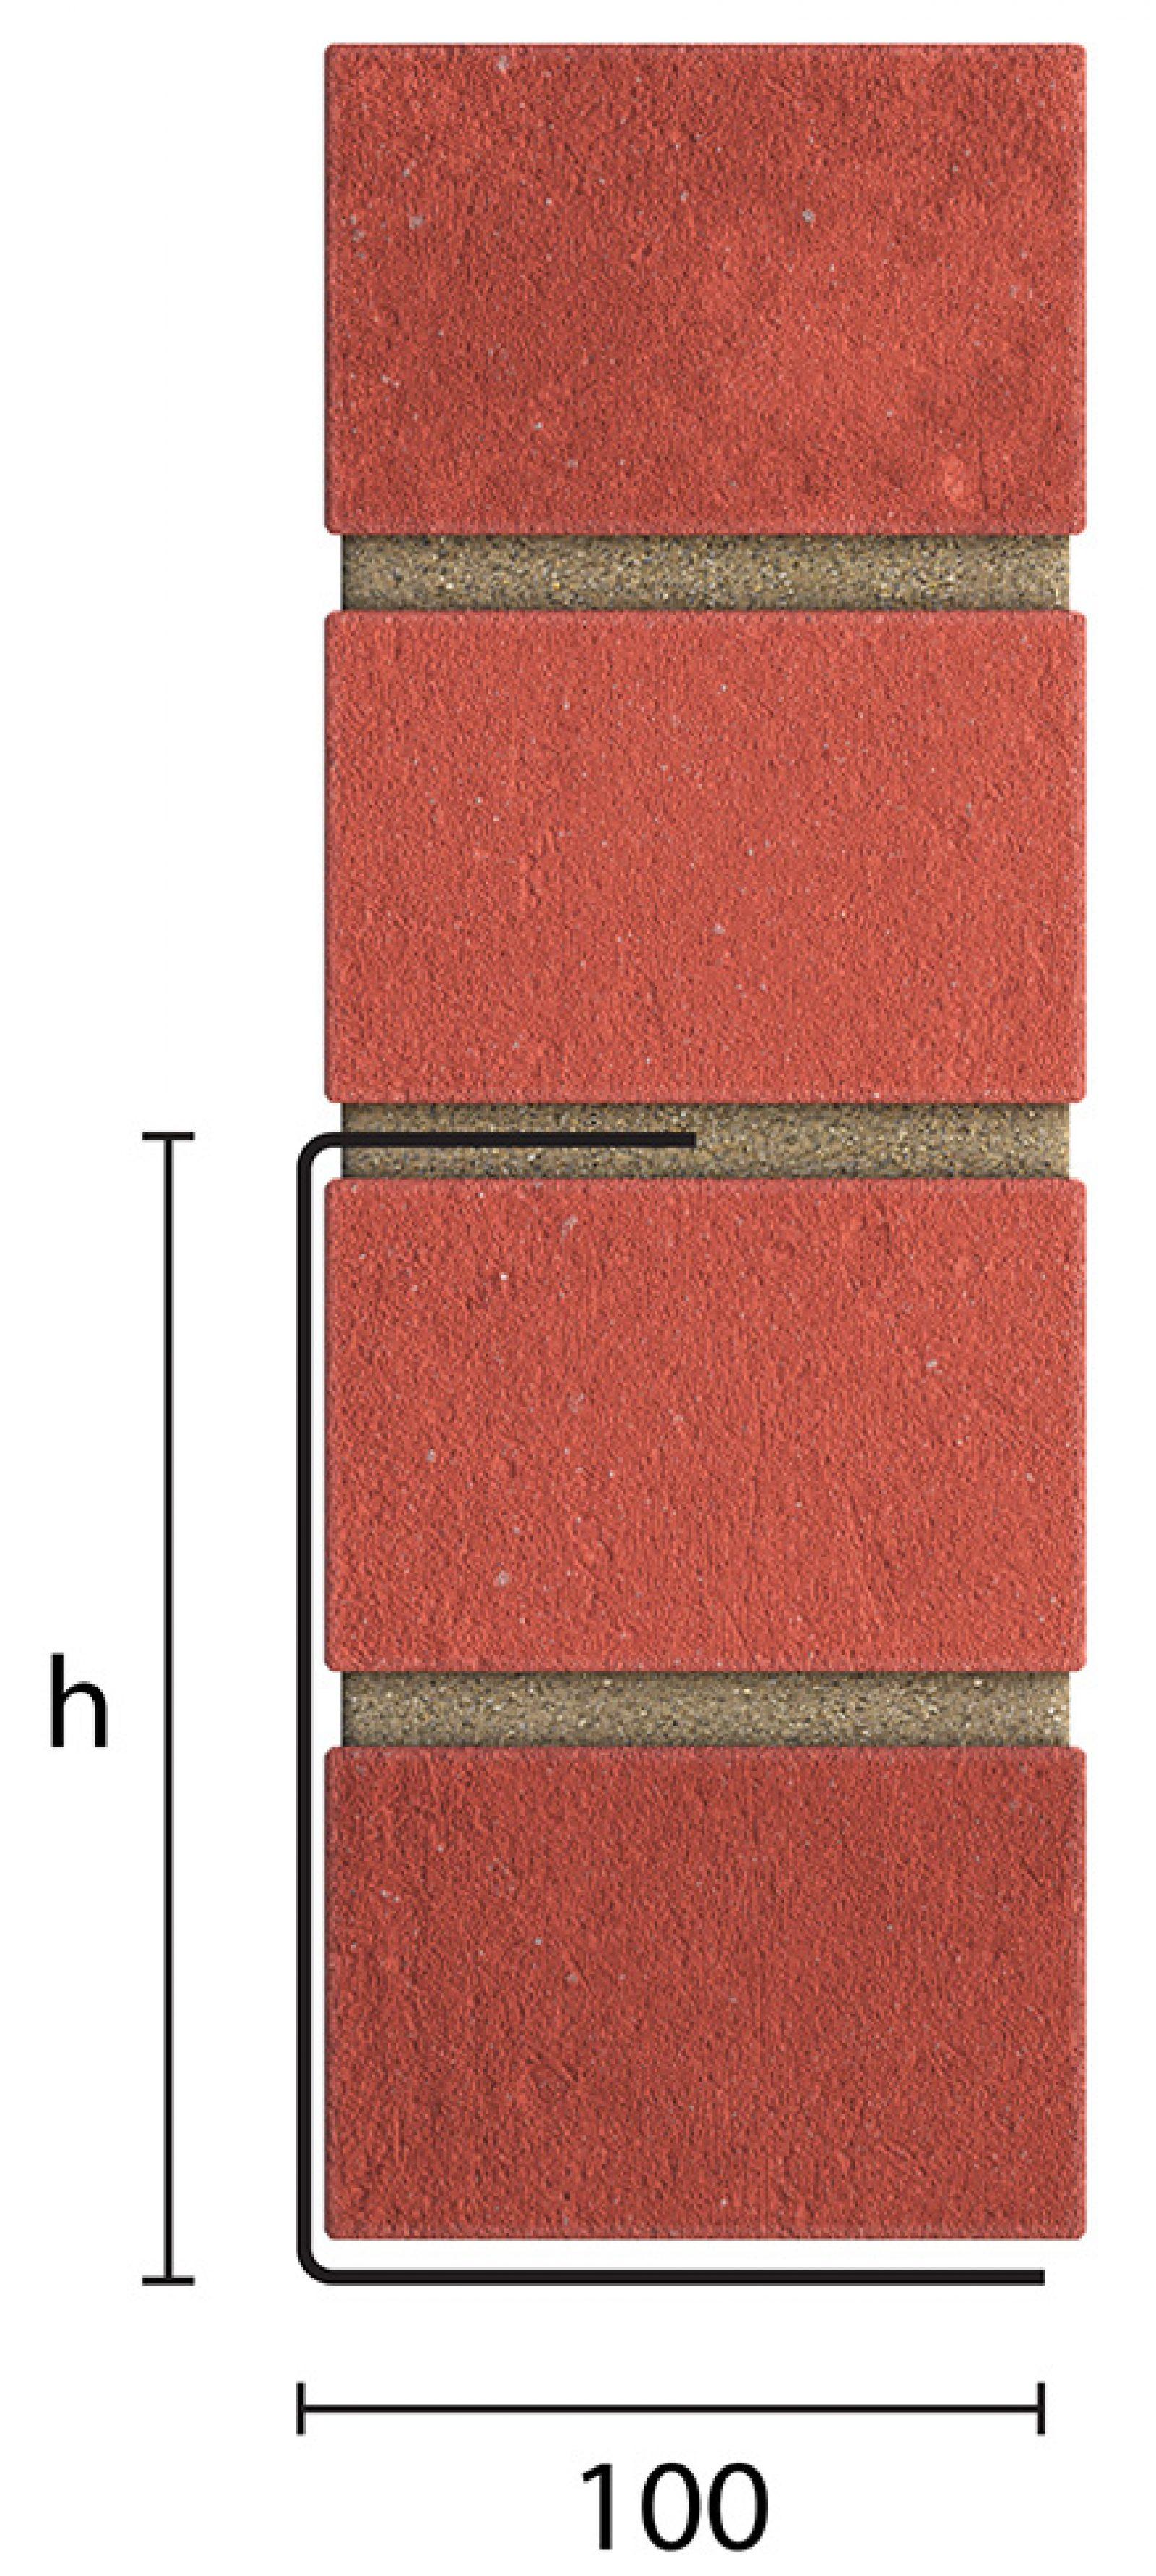 April events spotlight: SSR2® and Thermally broken lintels